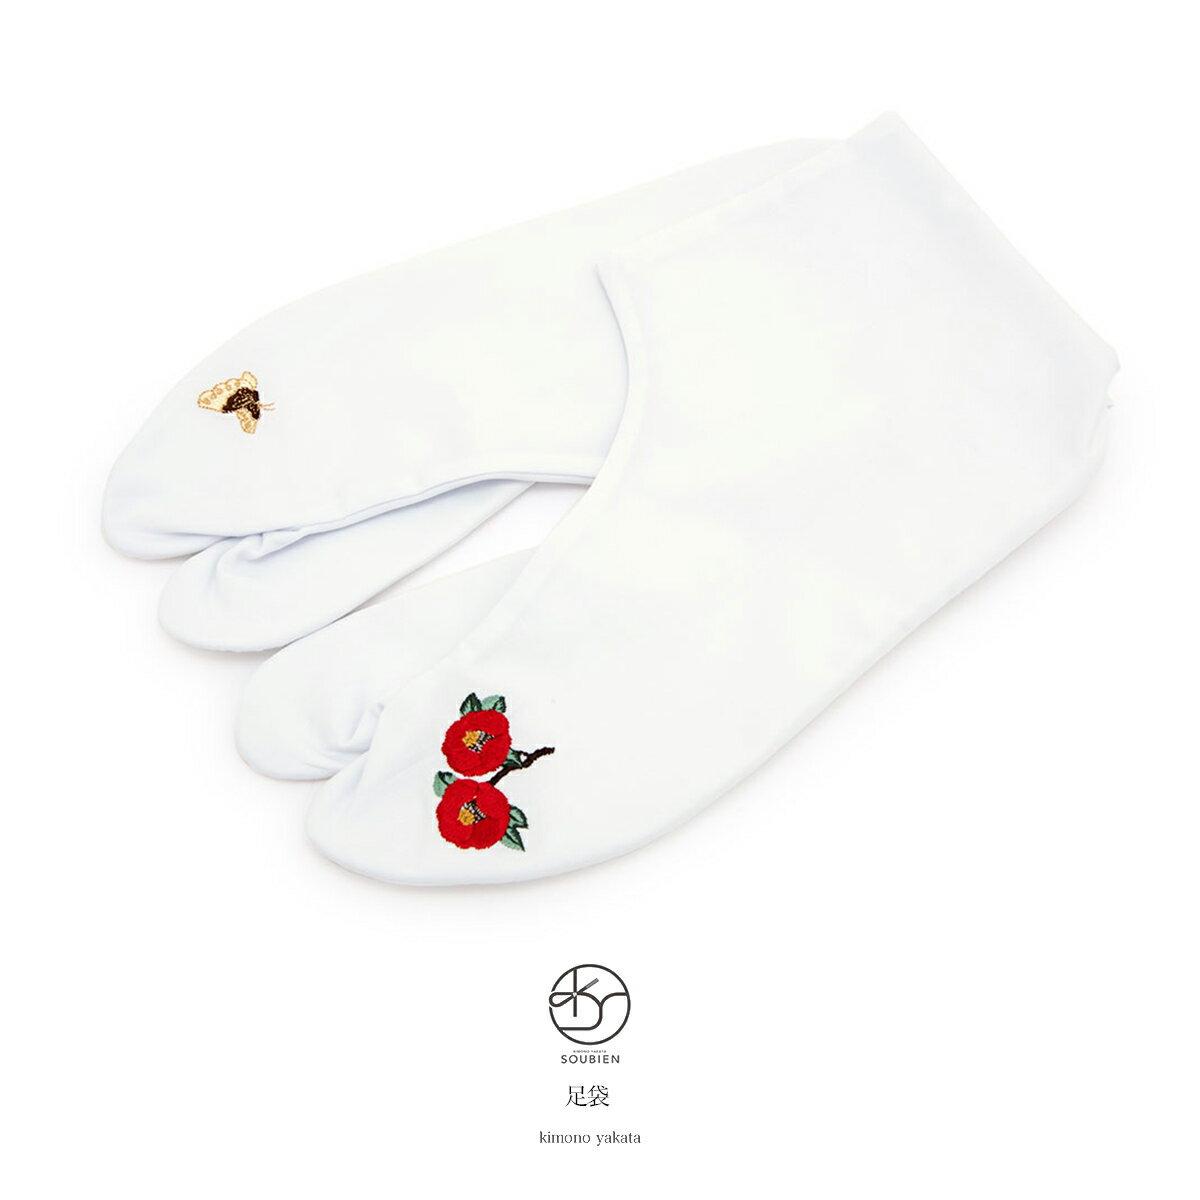 足袋 小紋用 紬用 振袖用 白足袋 刺繍足袋 椿 蝶 4枚コハゼ 着付け小物 和装小物 【22.5〜24.5cm】【あす楽対応】